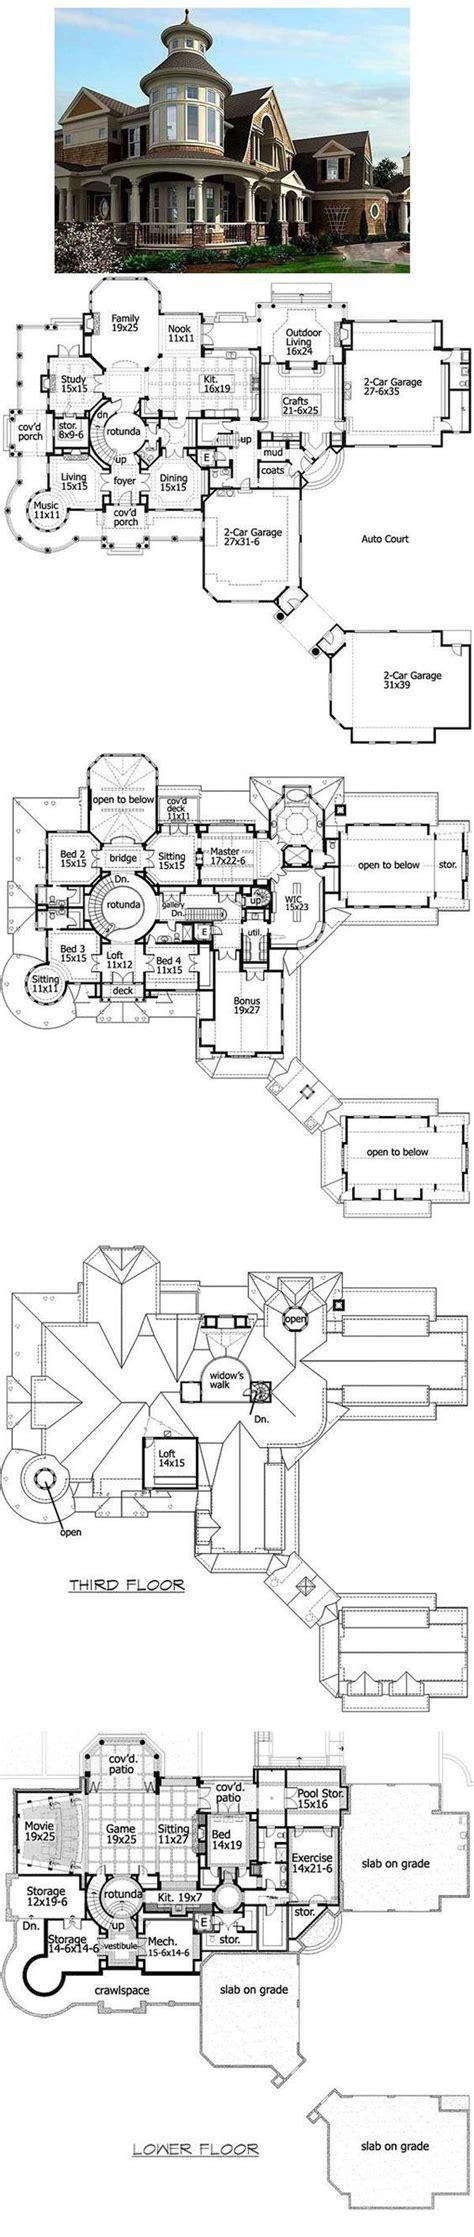 bishopsgate residences floor plan source crescent street bedroom house plans story open